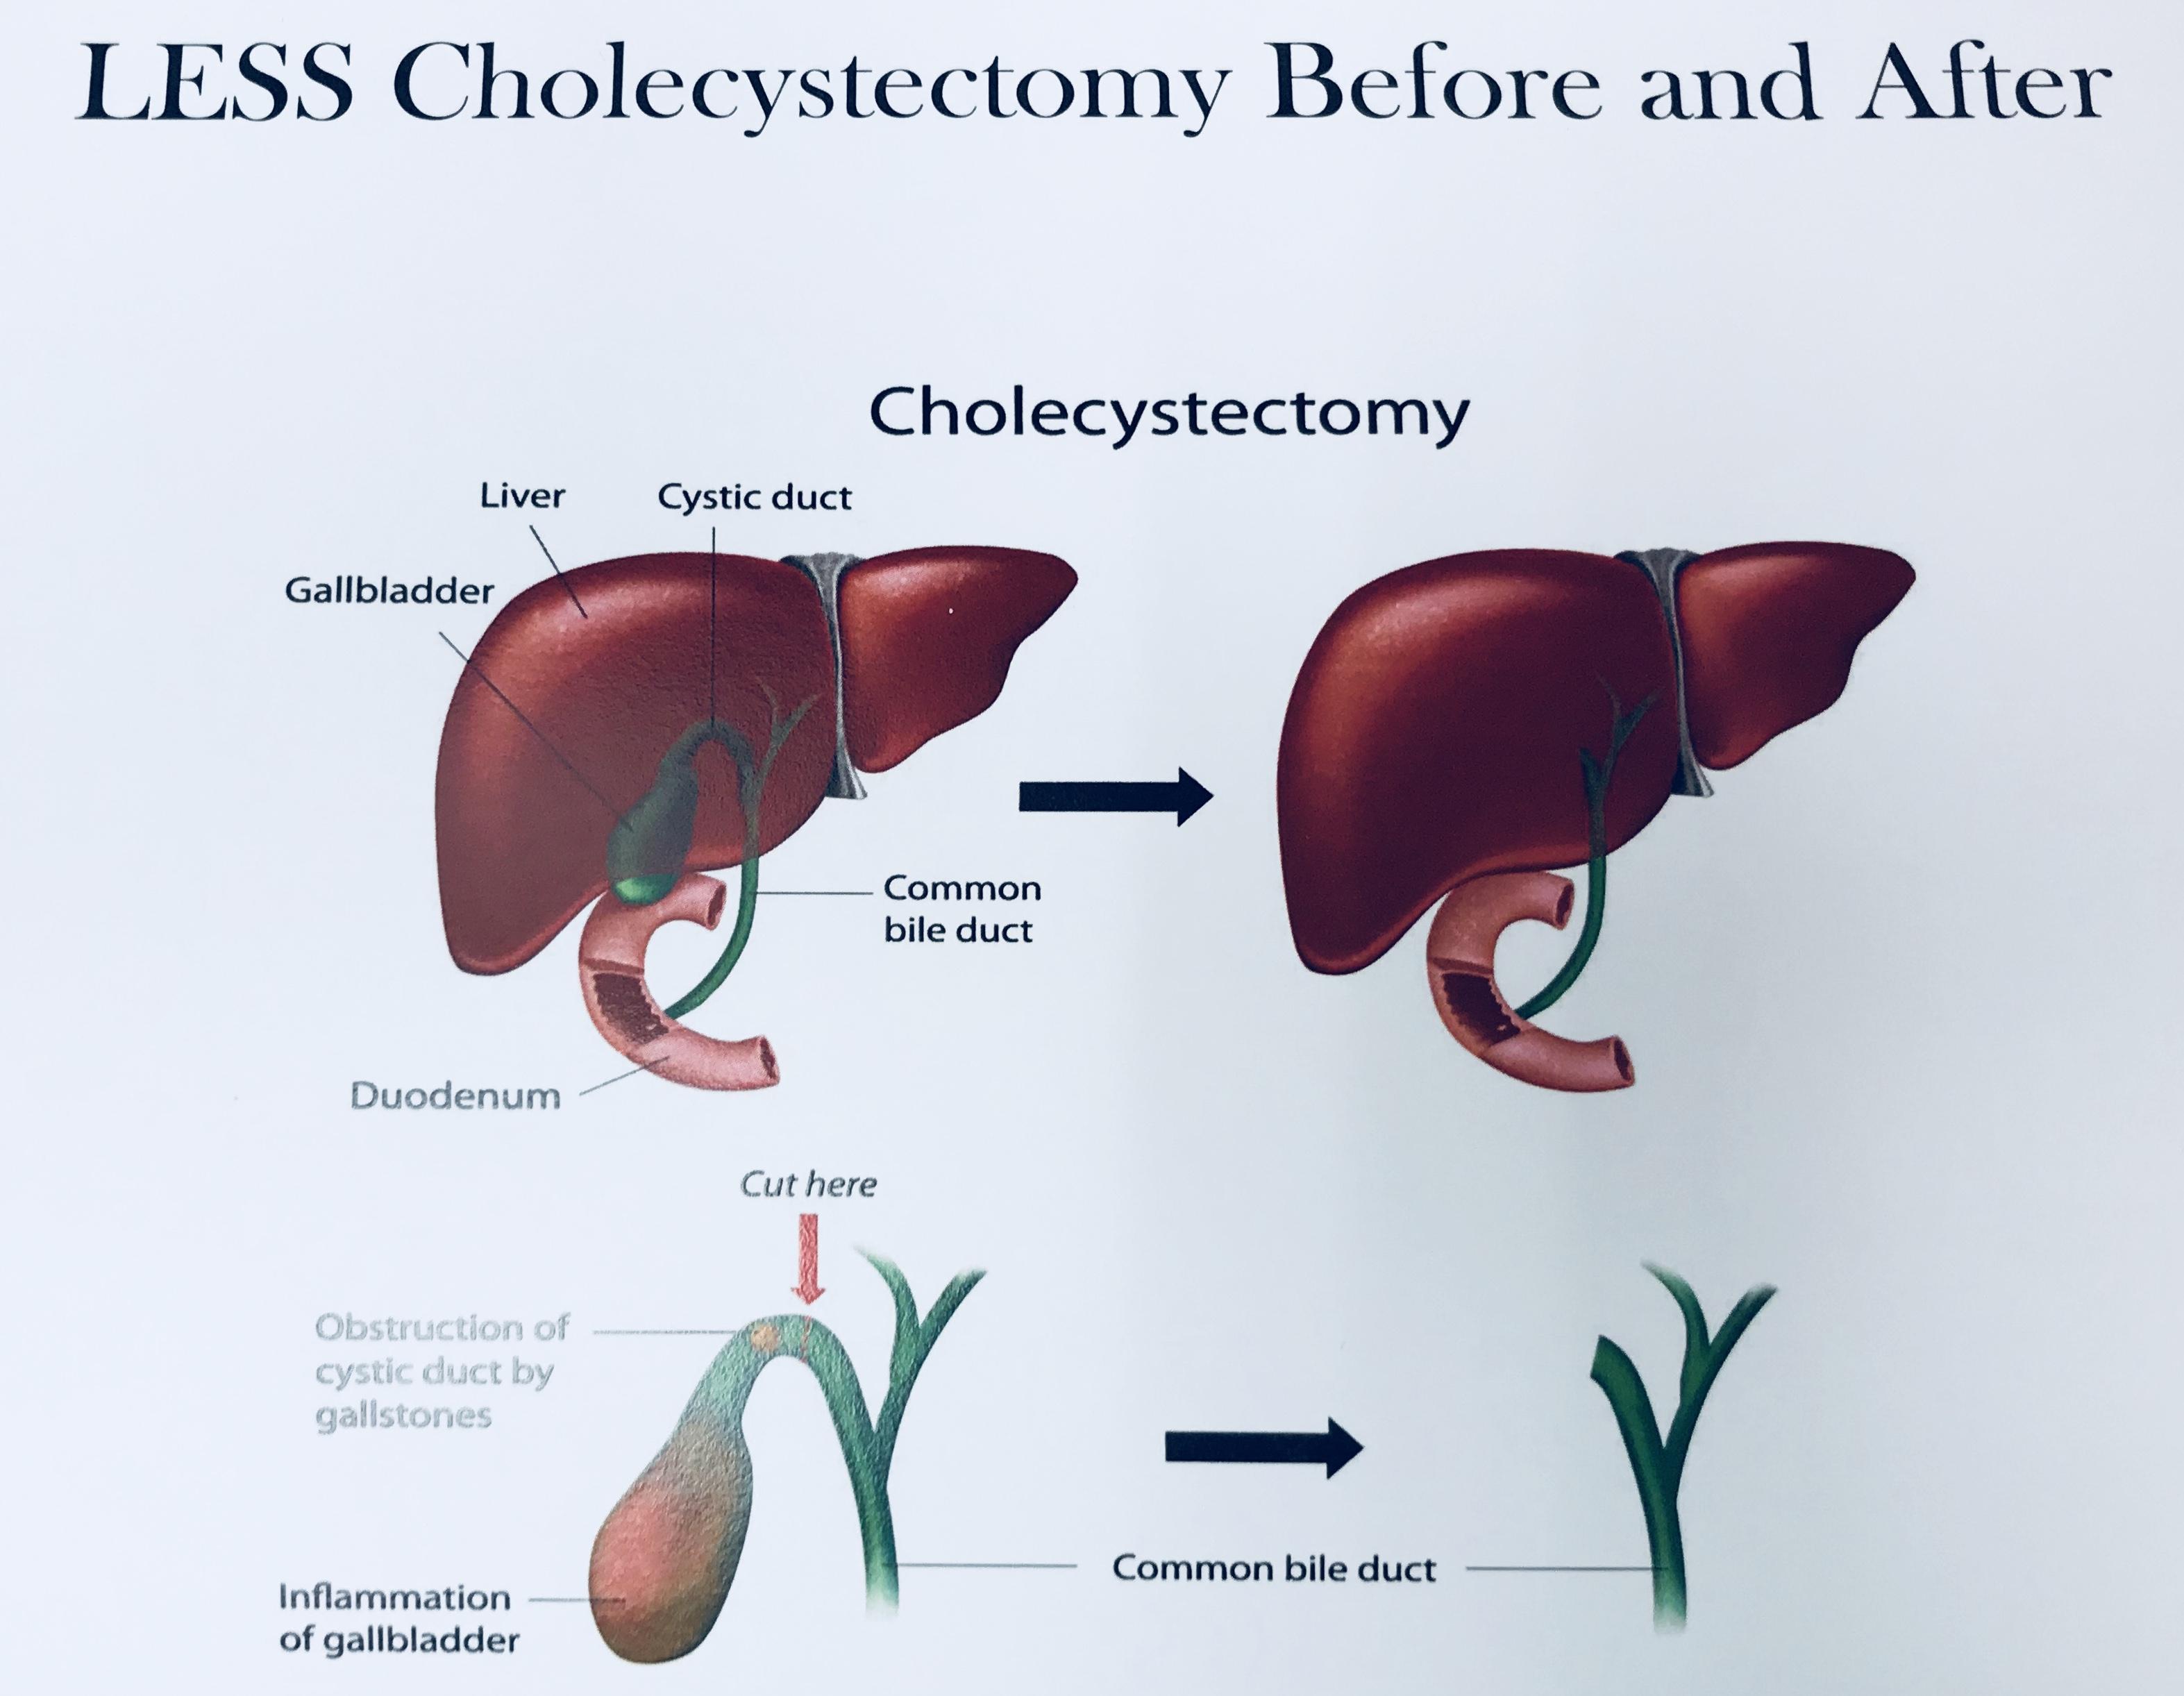 Gallbladder Surgery Cholecystectomy